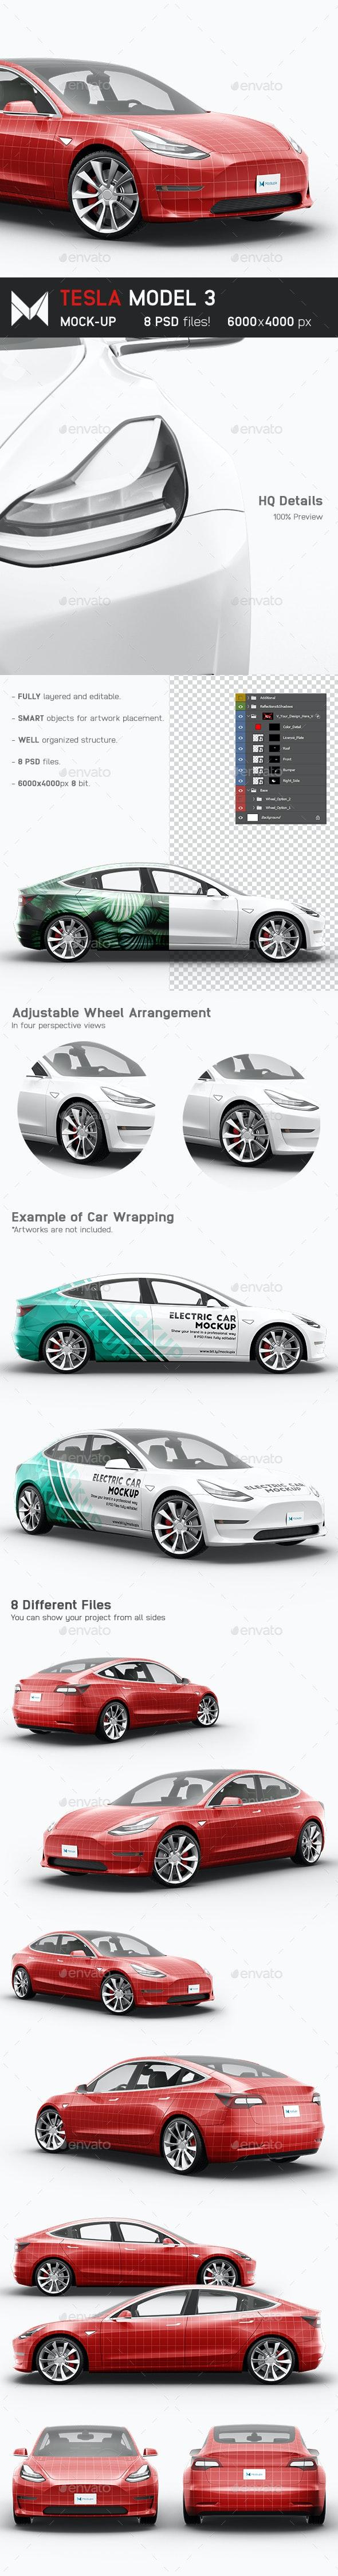 Tesla Model 3 Electric Car Mockup - Vehicle Wraps Print